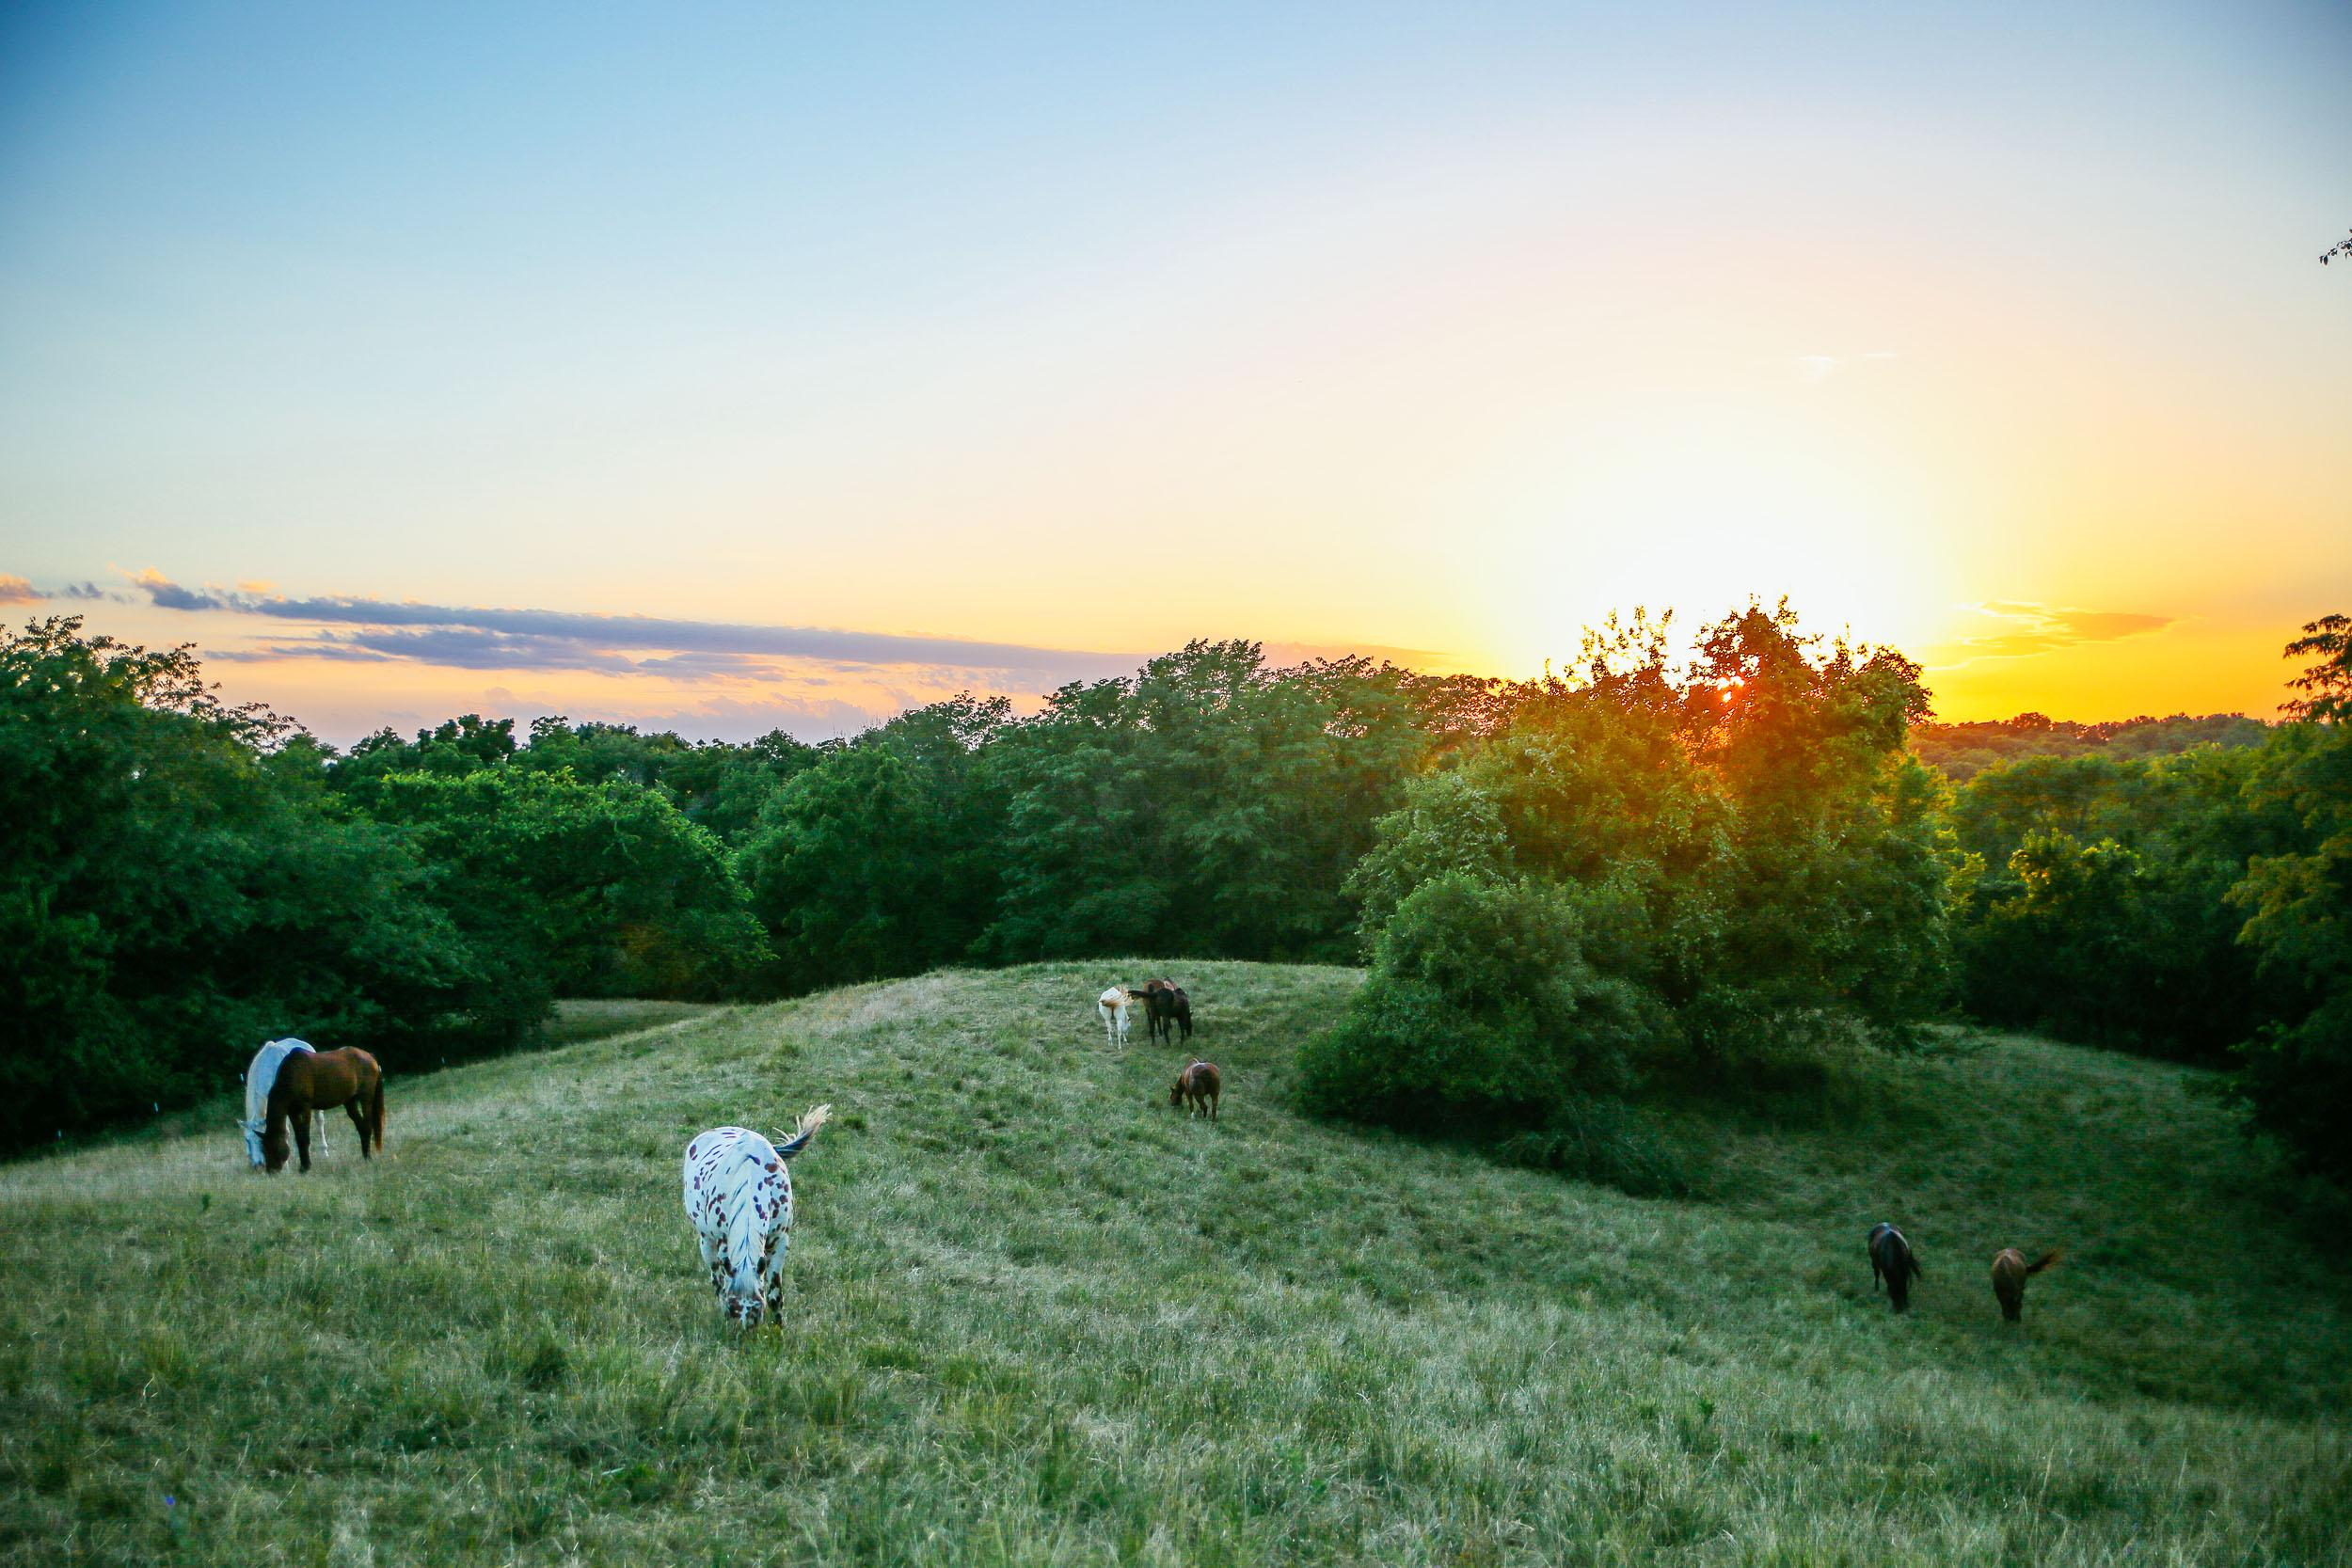 Heartland_Horses.jpg